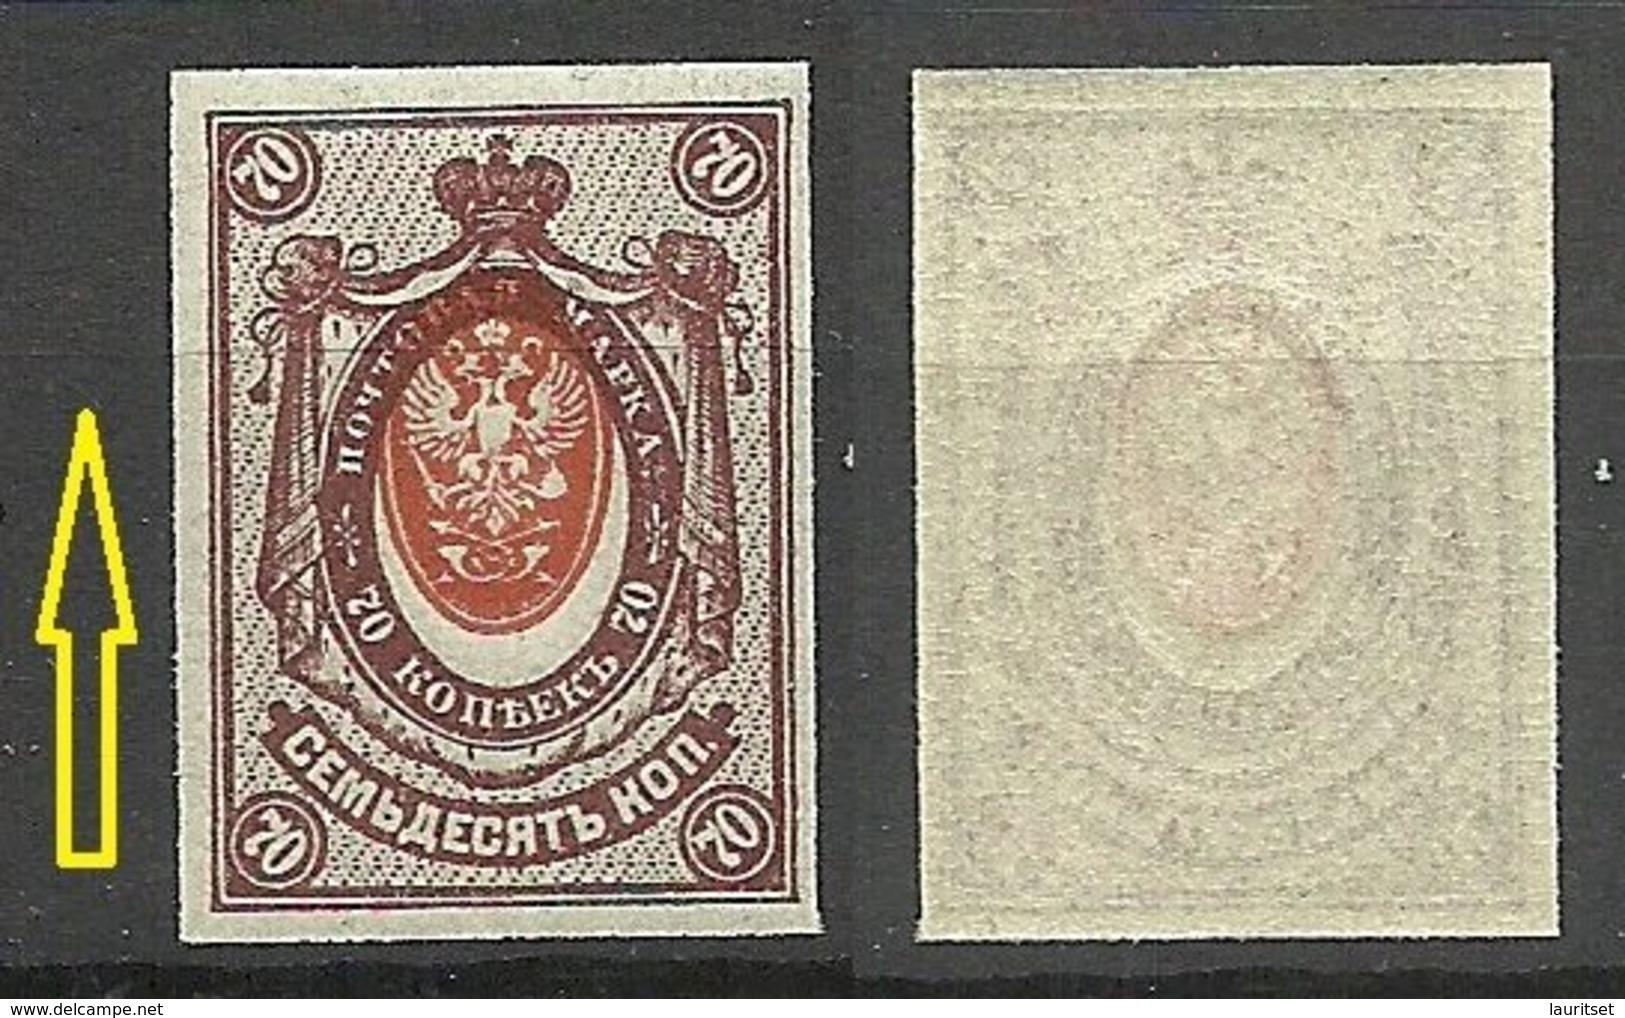 RUSSLAND RUSSIA 1917 Michel 76 B ERROR Abart Variety Shifted Center Print MNH - Errors & Oddities